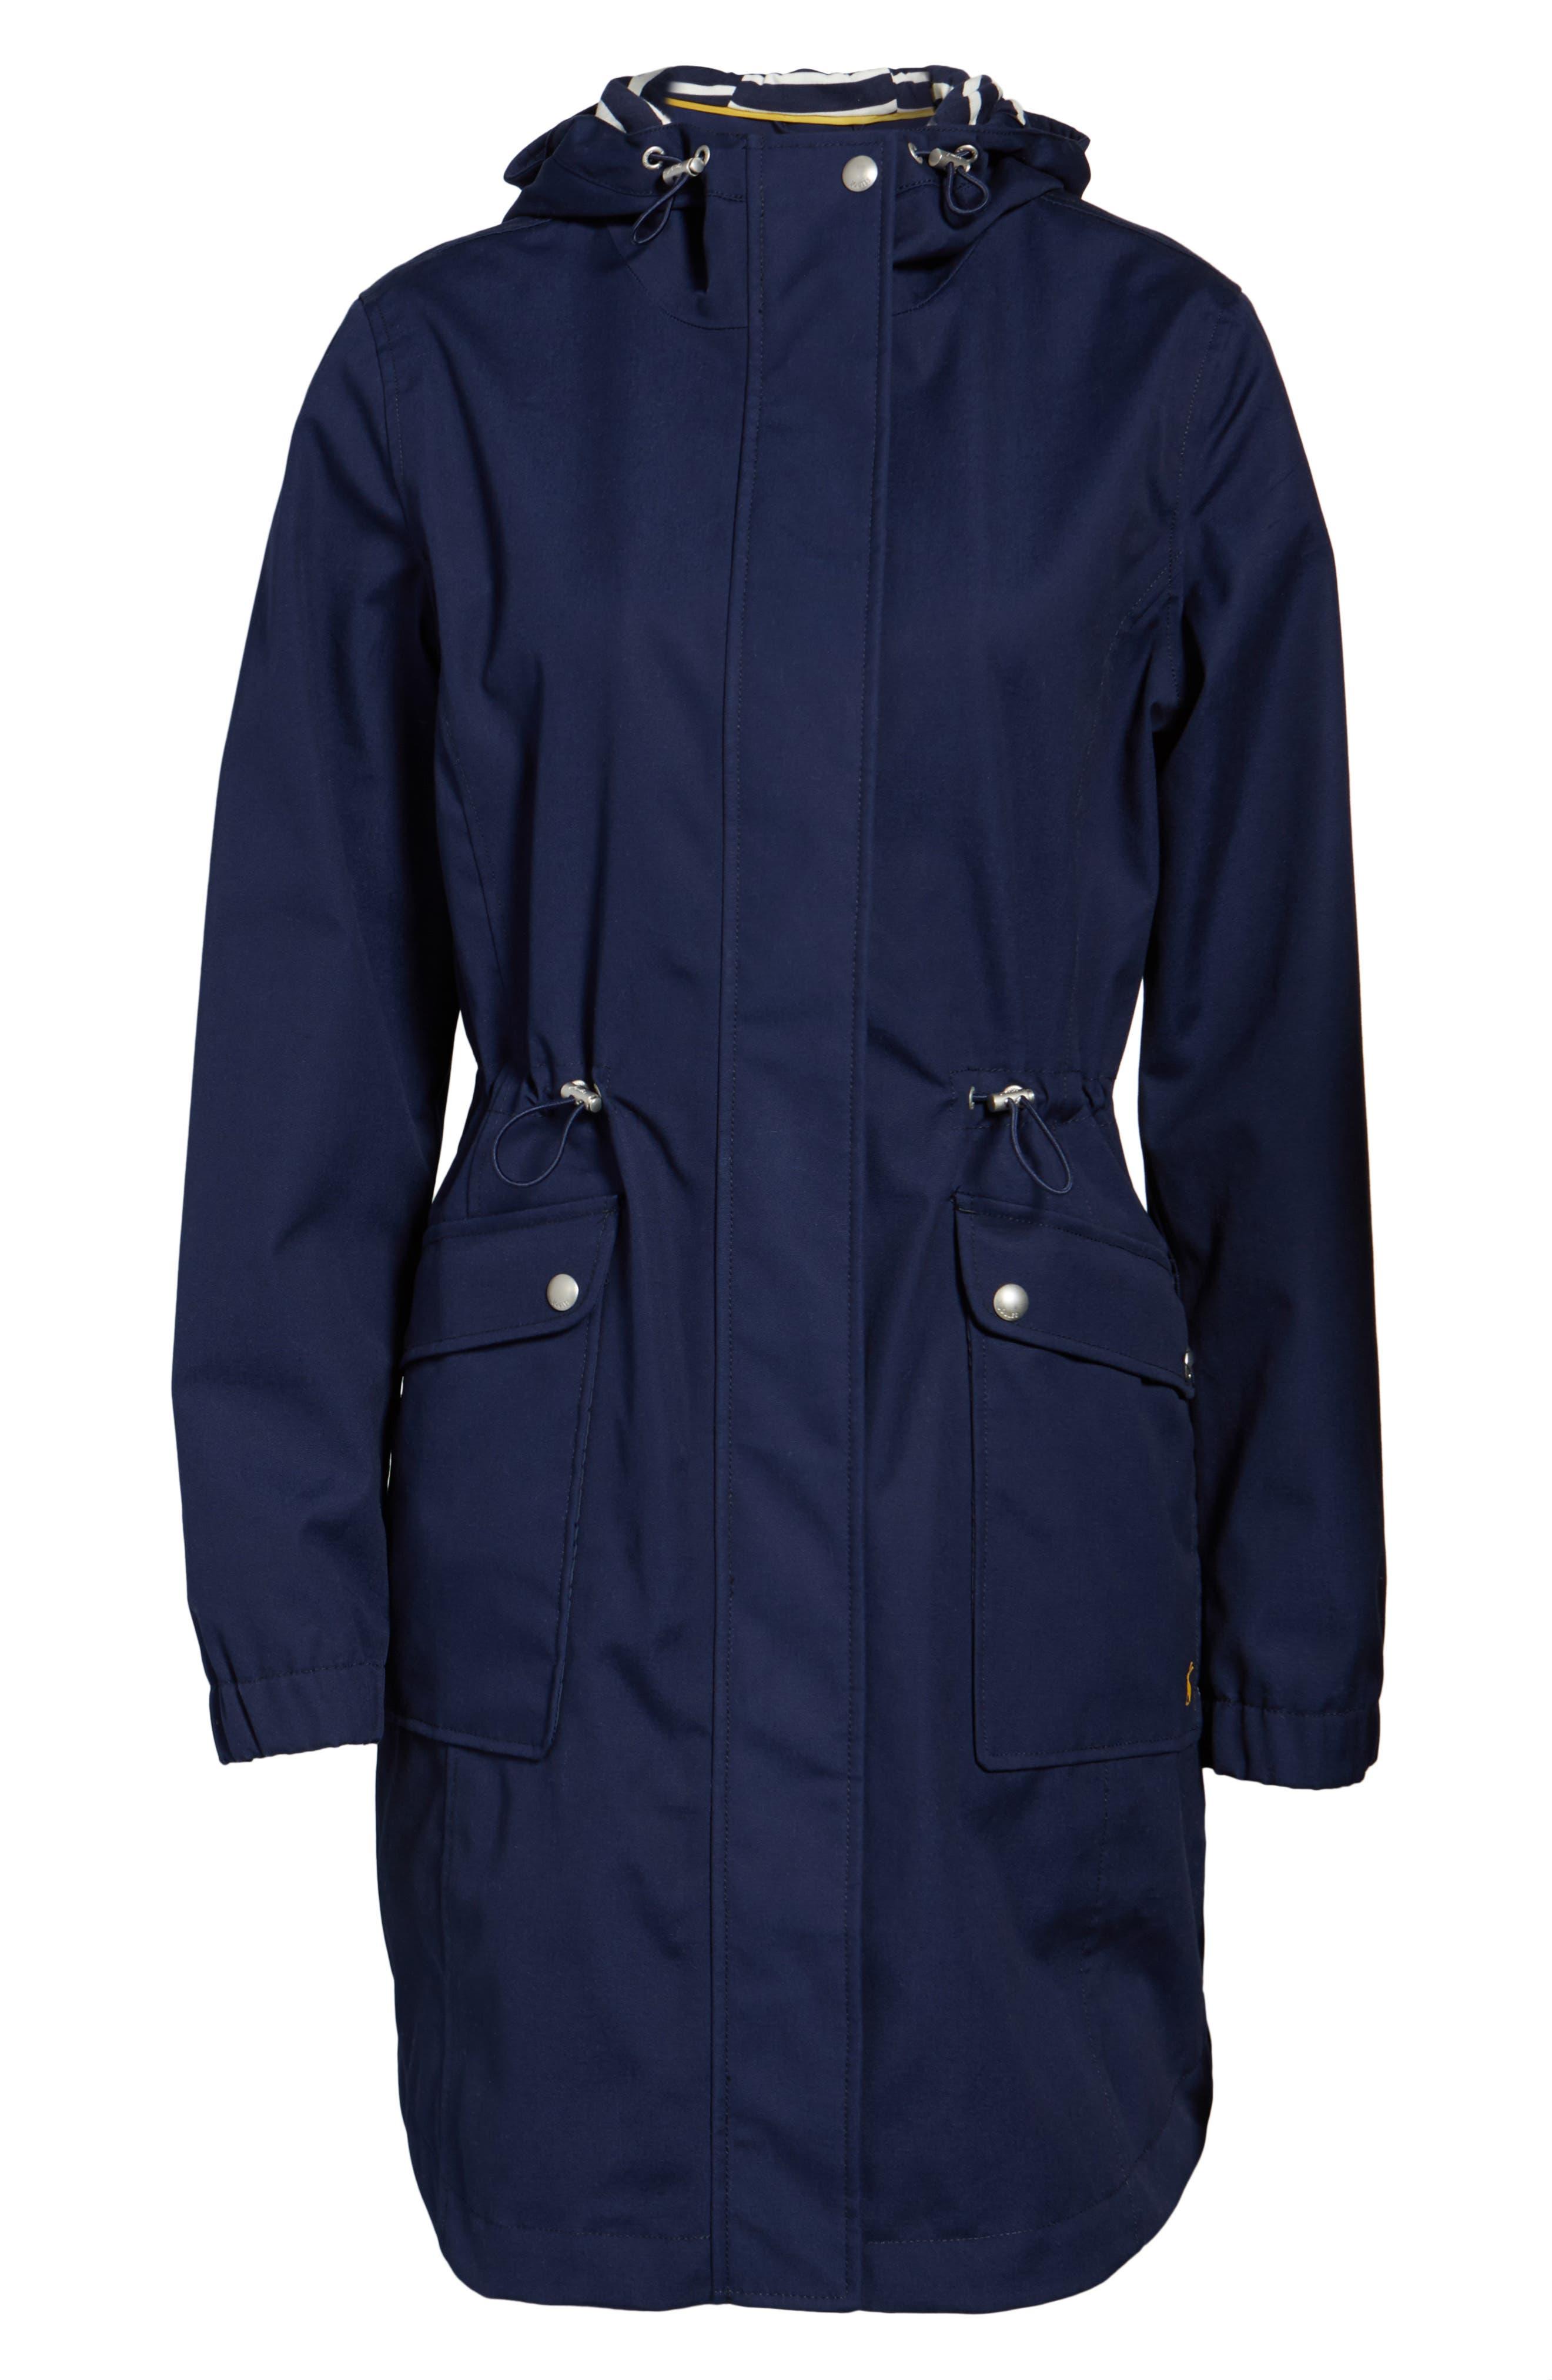 Right as Rain Waterproof Hooded Jacket,                             Alternate thumbnail 5, color,                             411